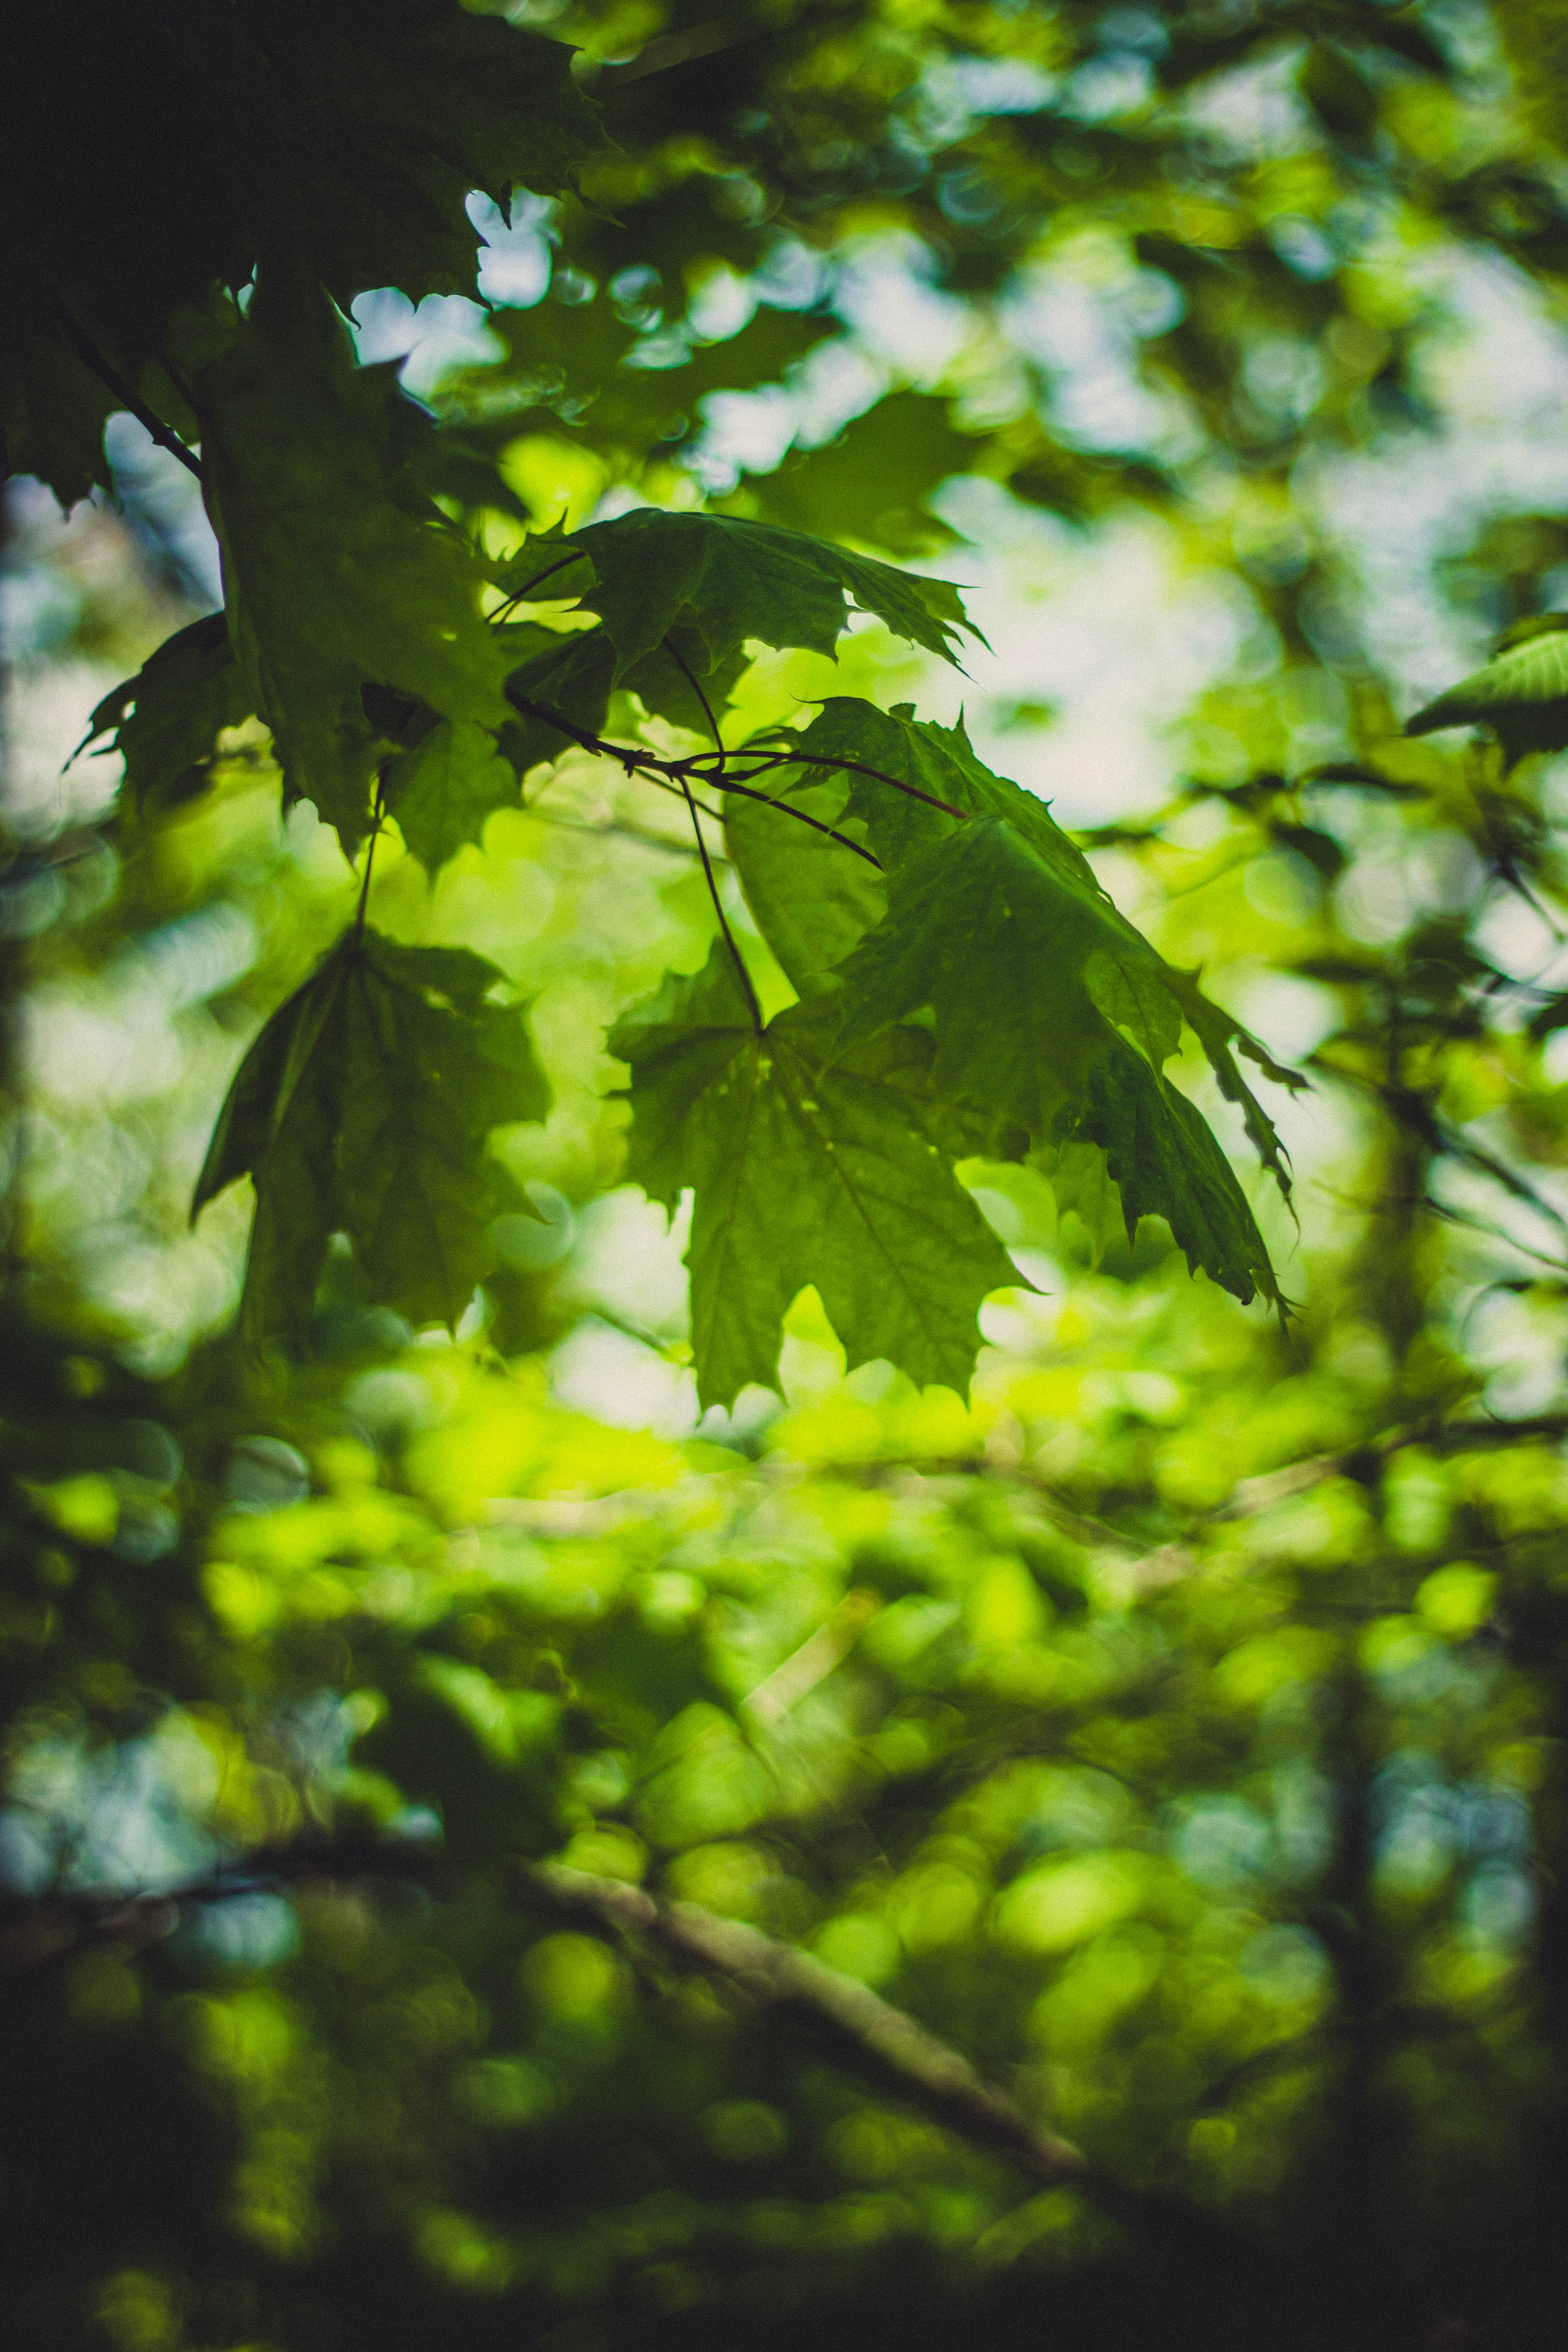 Green Lobed Leaves on Branch, Botany, Macro, Tree, Sunlight, HQ Photo